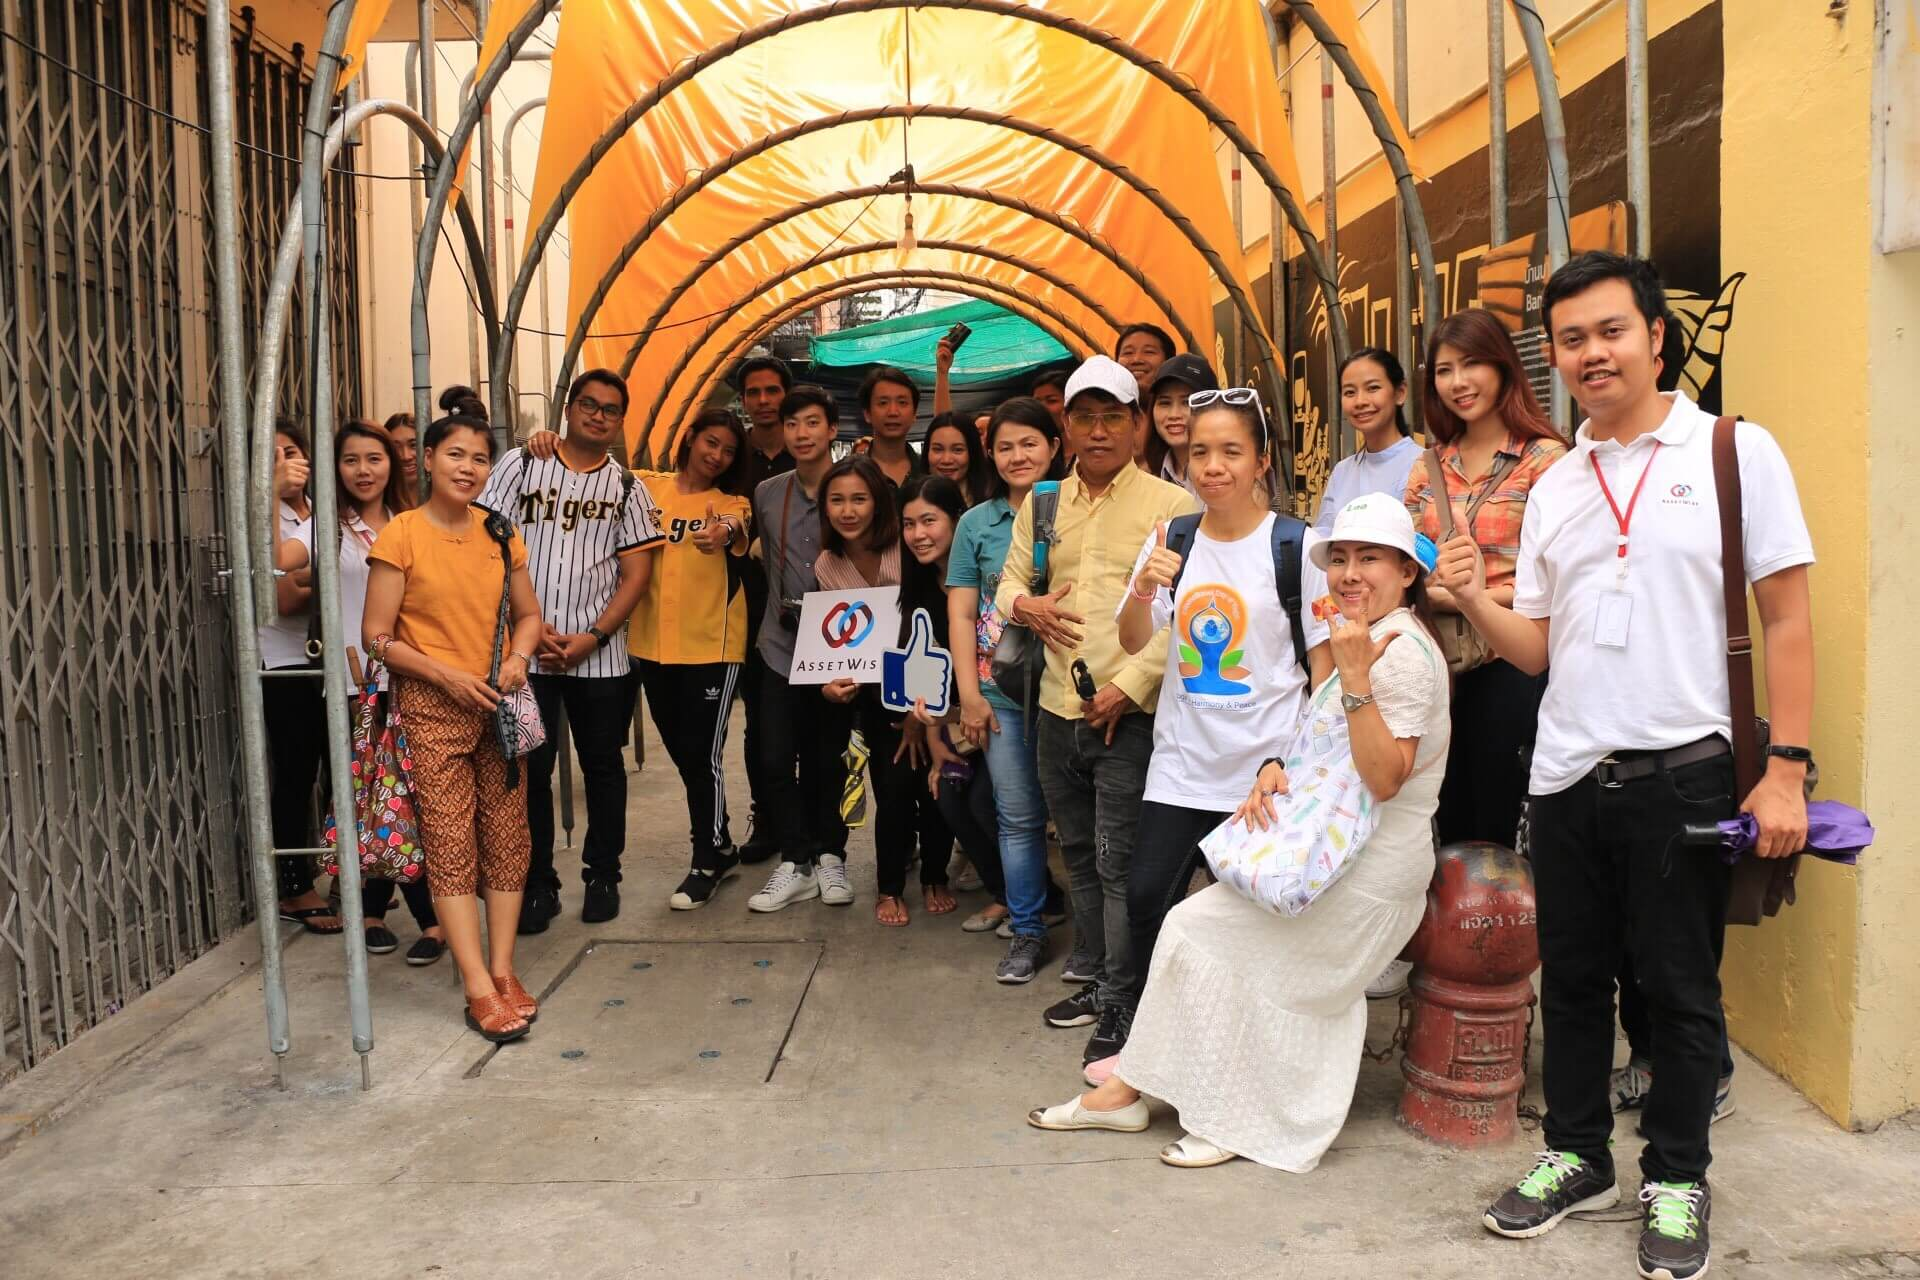 Happy Good Day Trip ครั้งที่ 1 ชิล แอนด์ ชิม รอบเกาะรัตนโกสินทร์